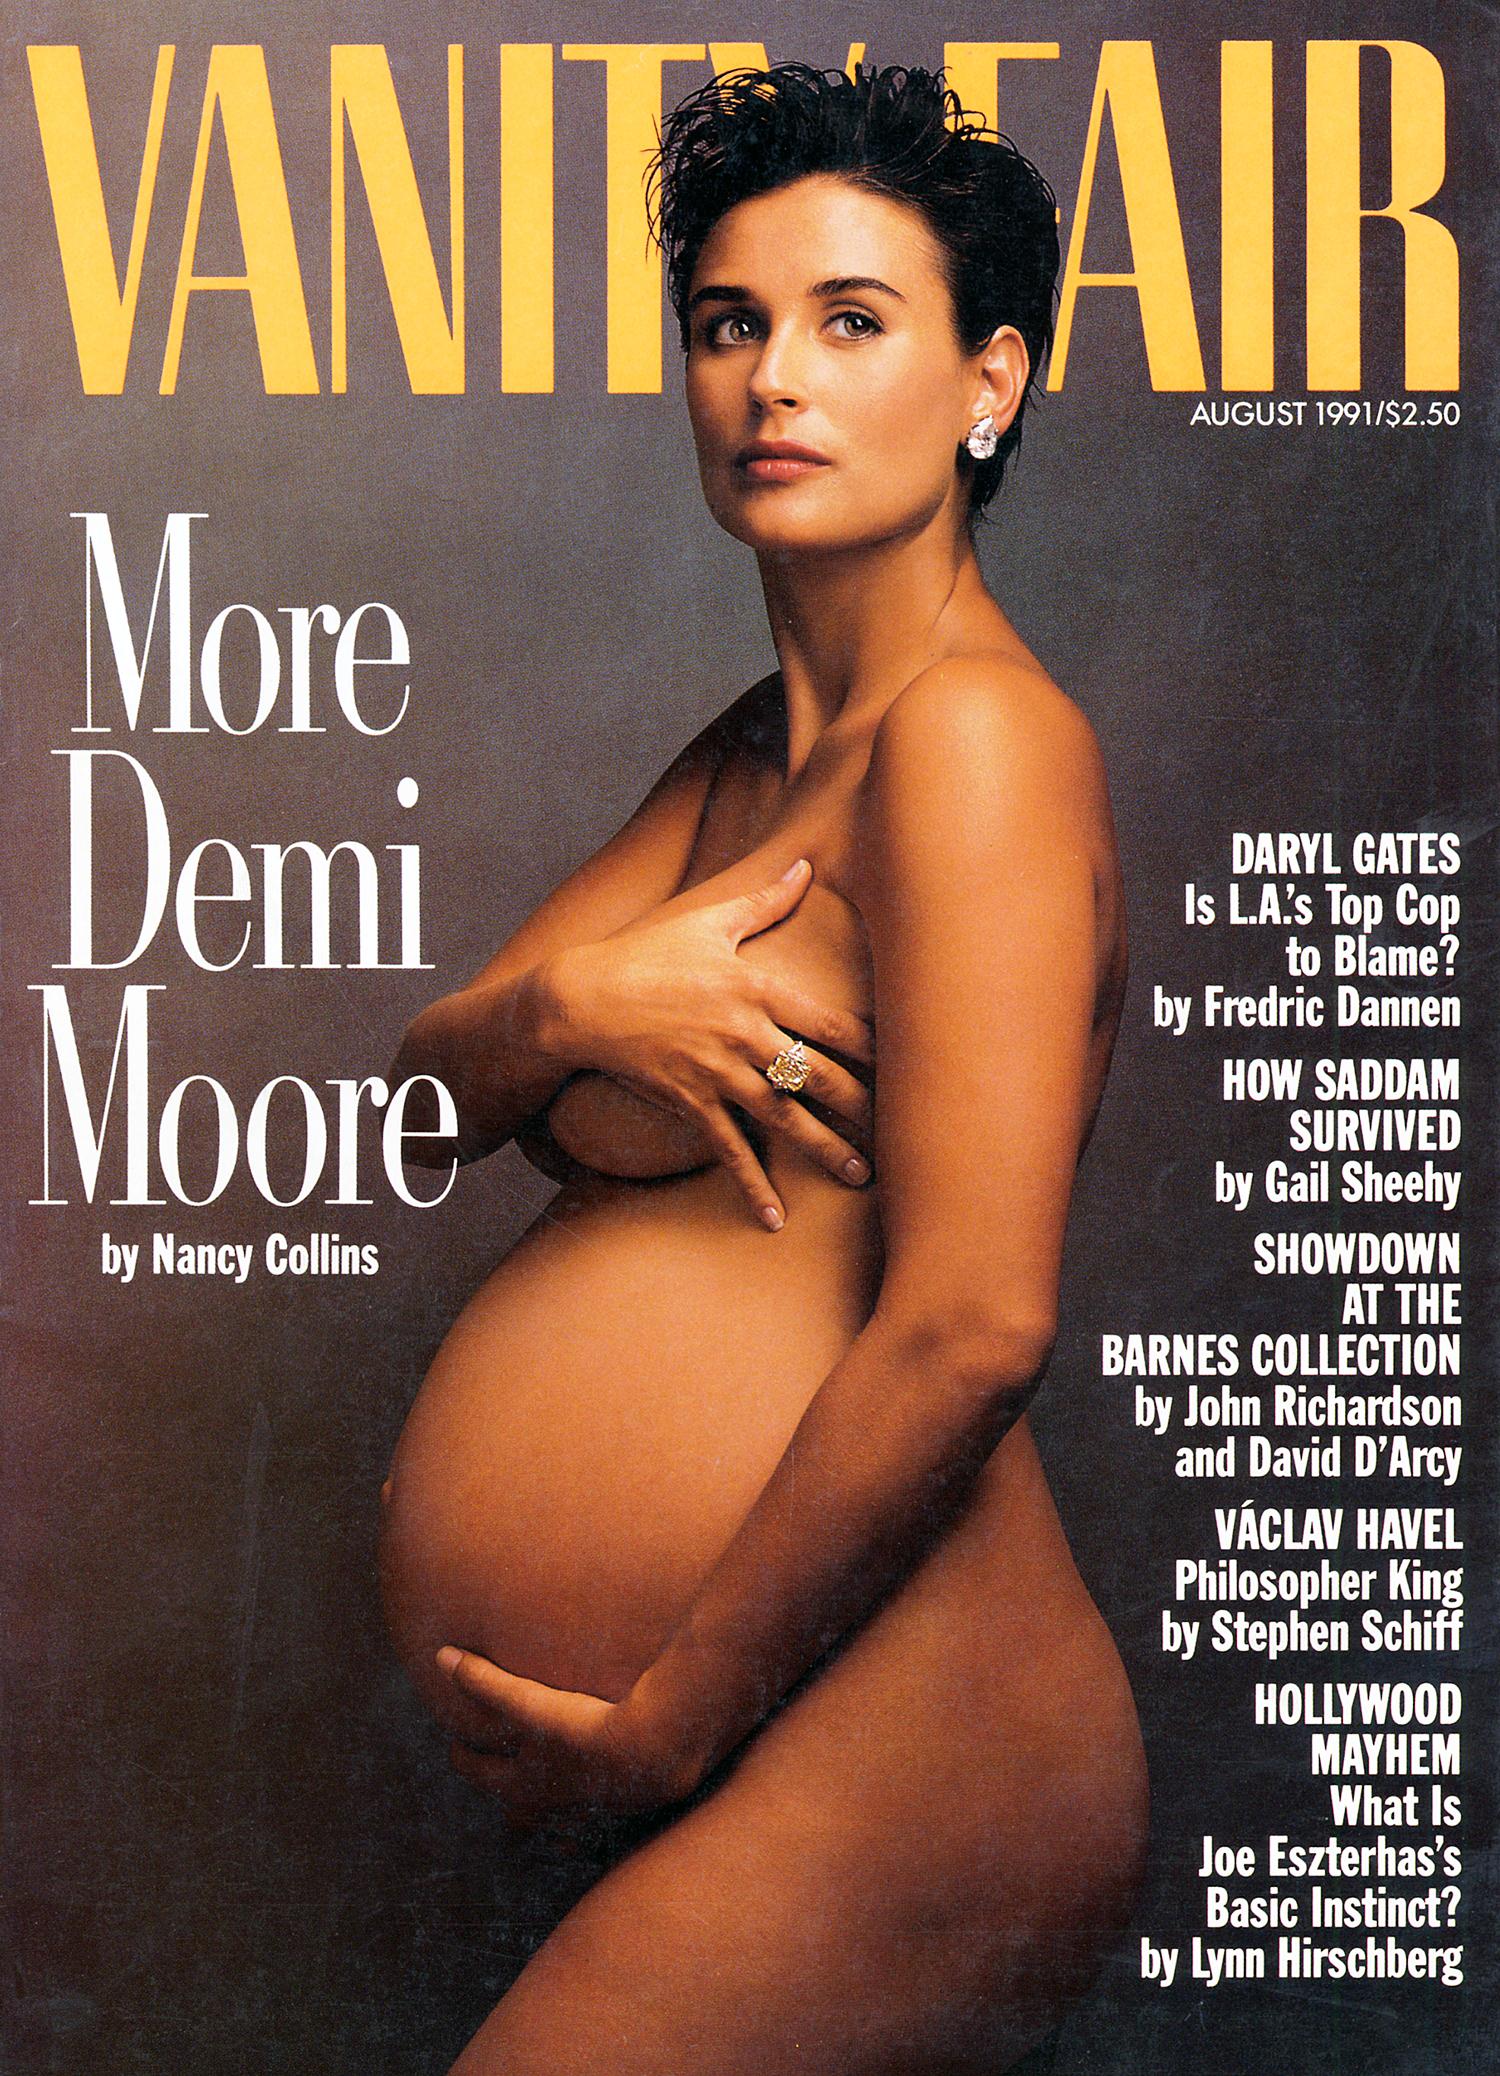 Demi Moore Vanity Fair cover 1991